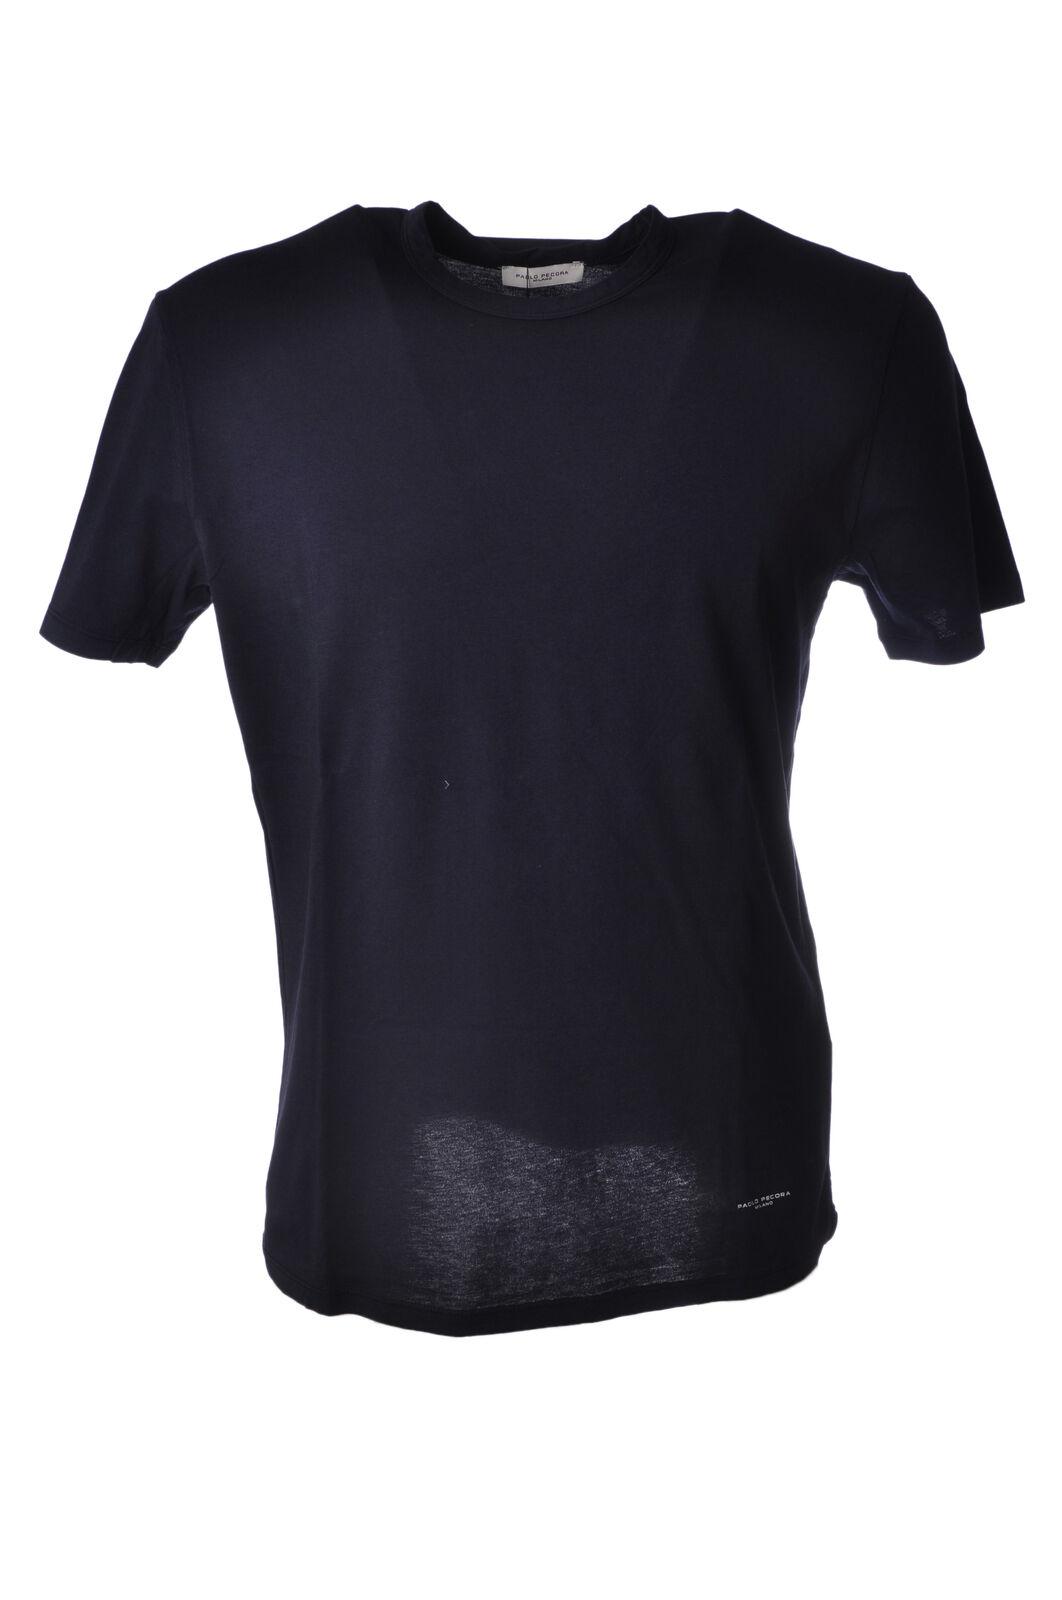 Paolo Pecora - Topwear-T-shirts - Mann - blue - 5040404E183812